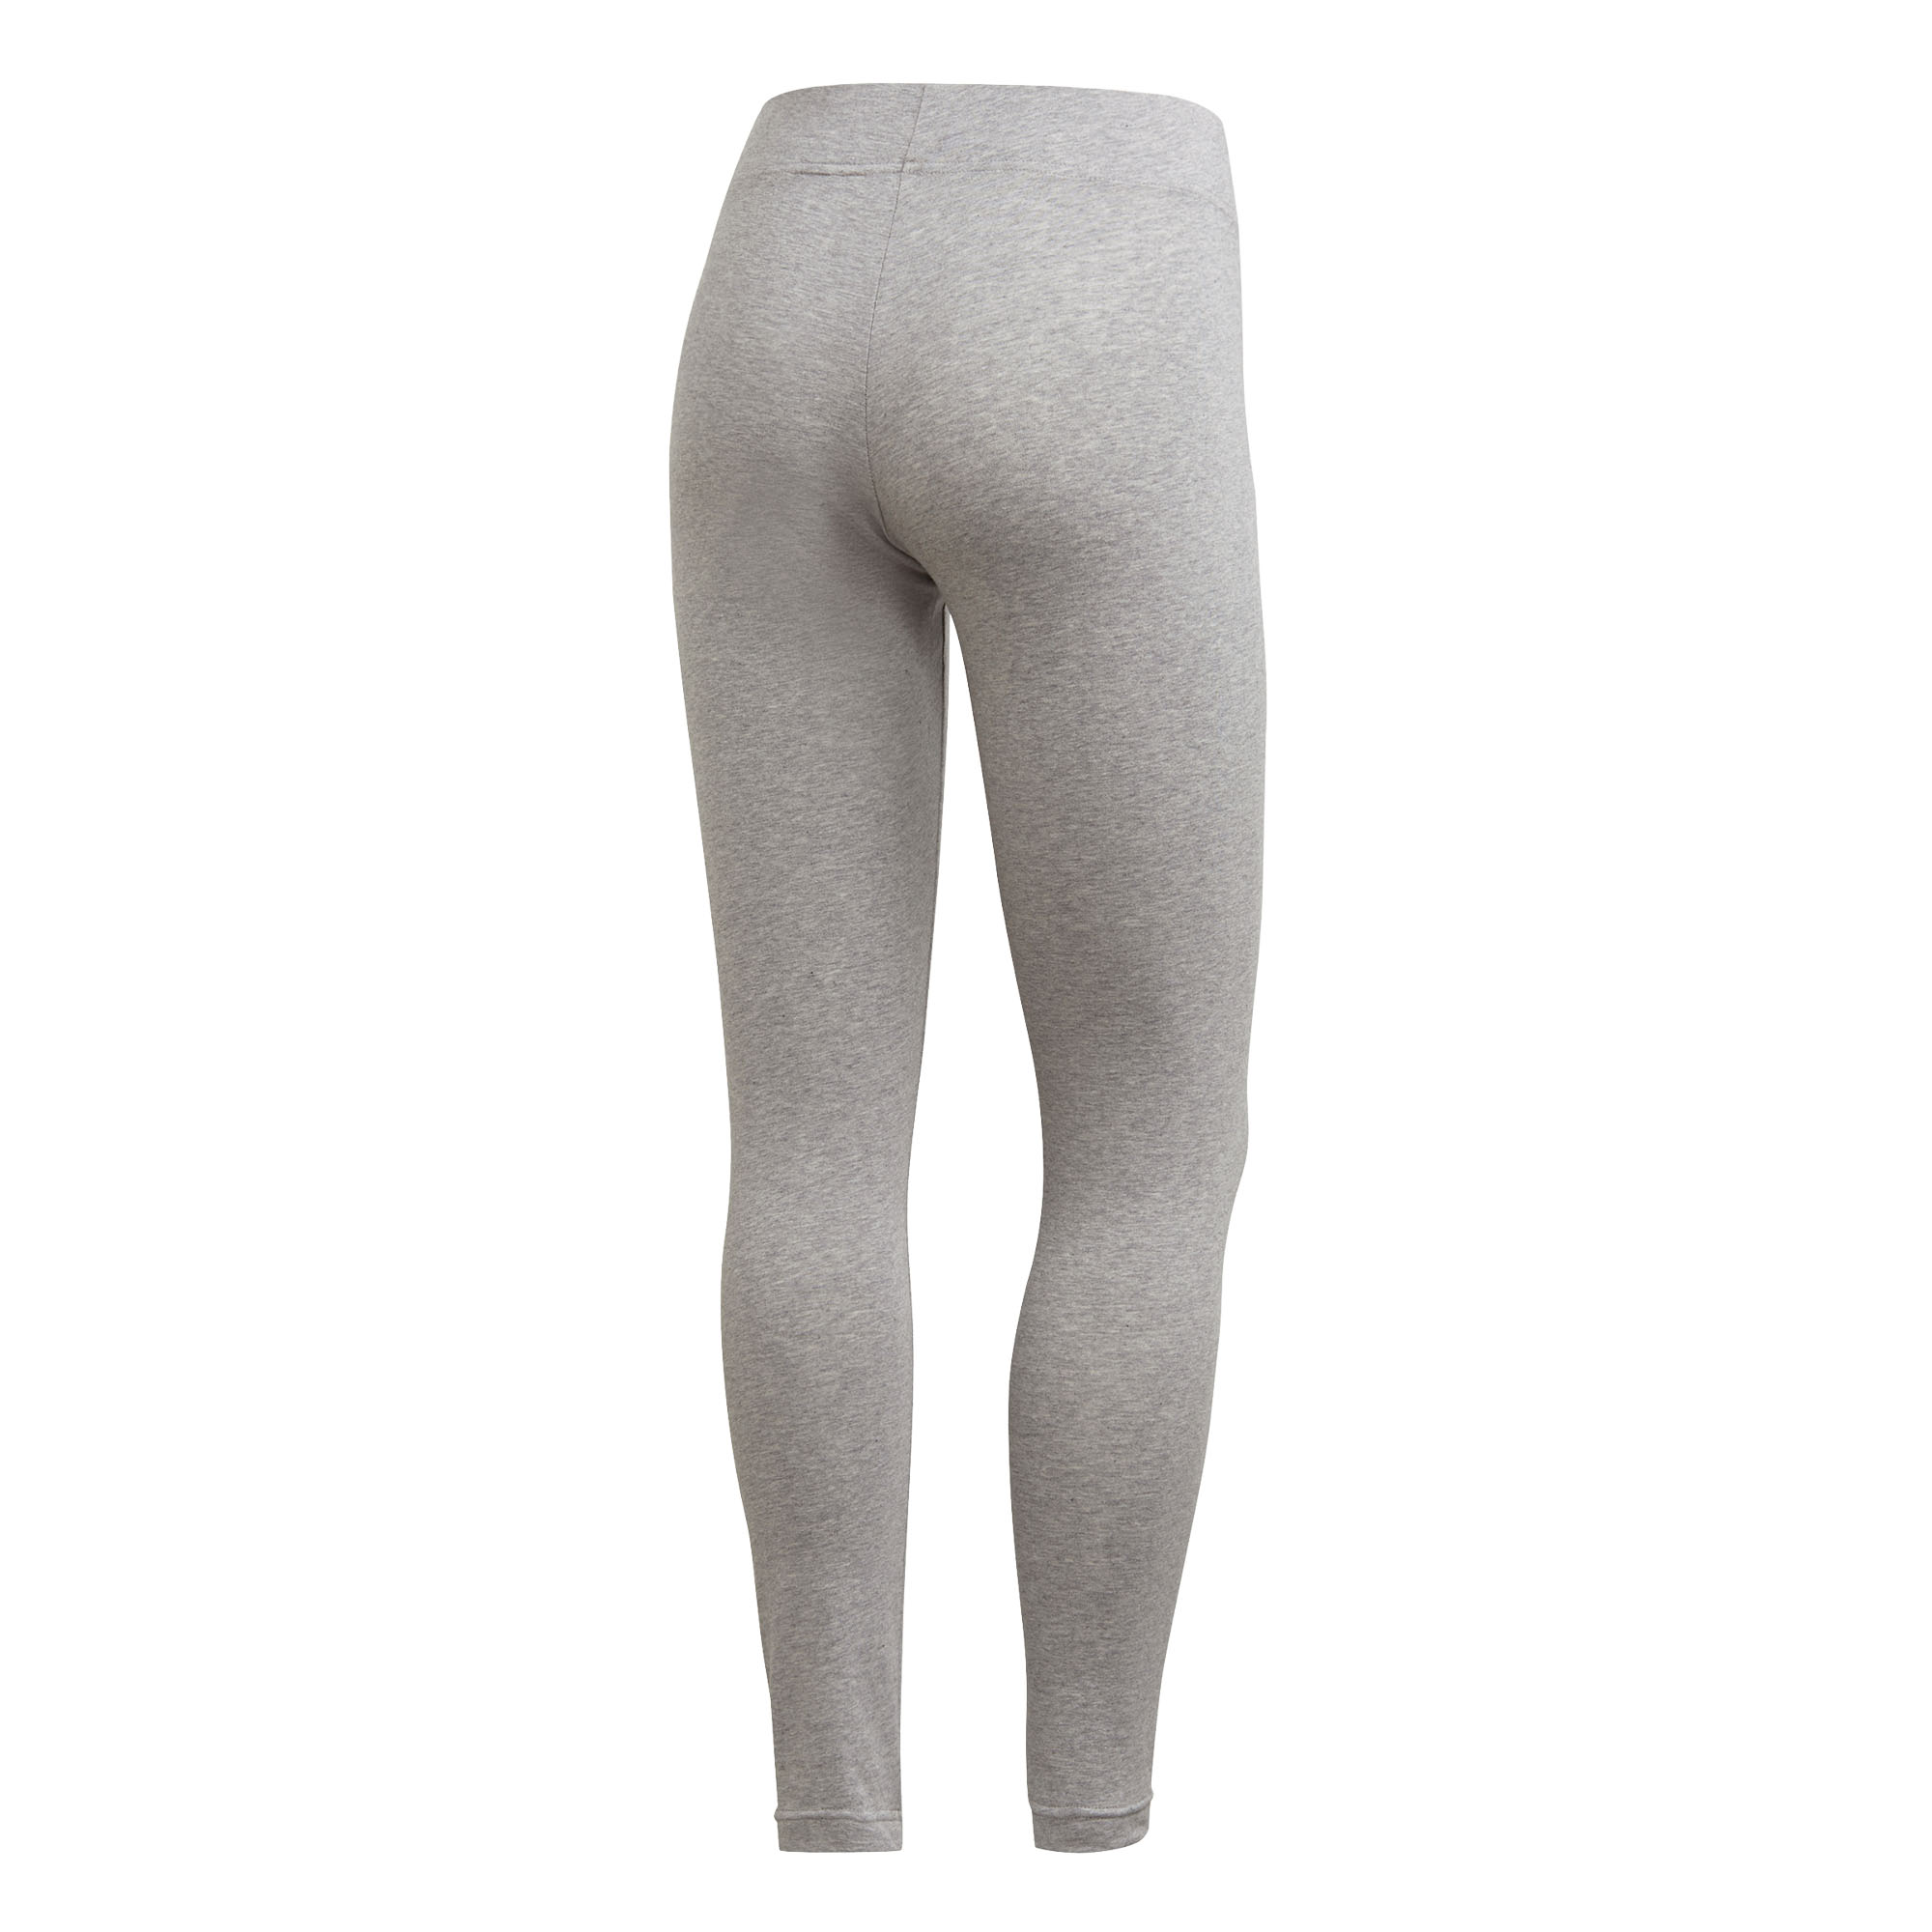 adidas-Essentials-Linear-Womens-Ladies-Fitness-Gym-Legging-Grey-Pink thumbnail 4